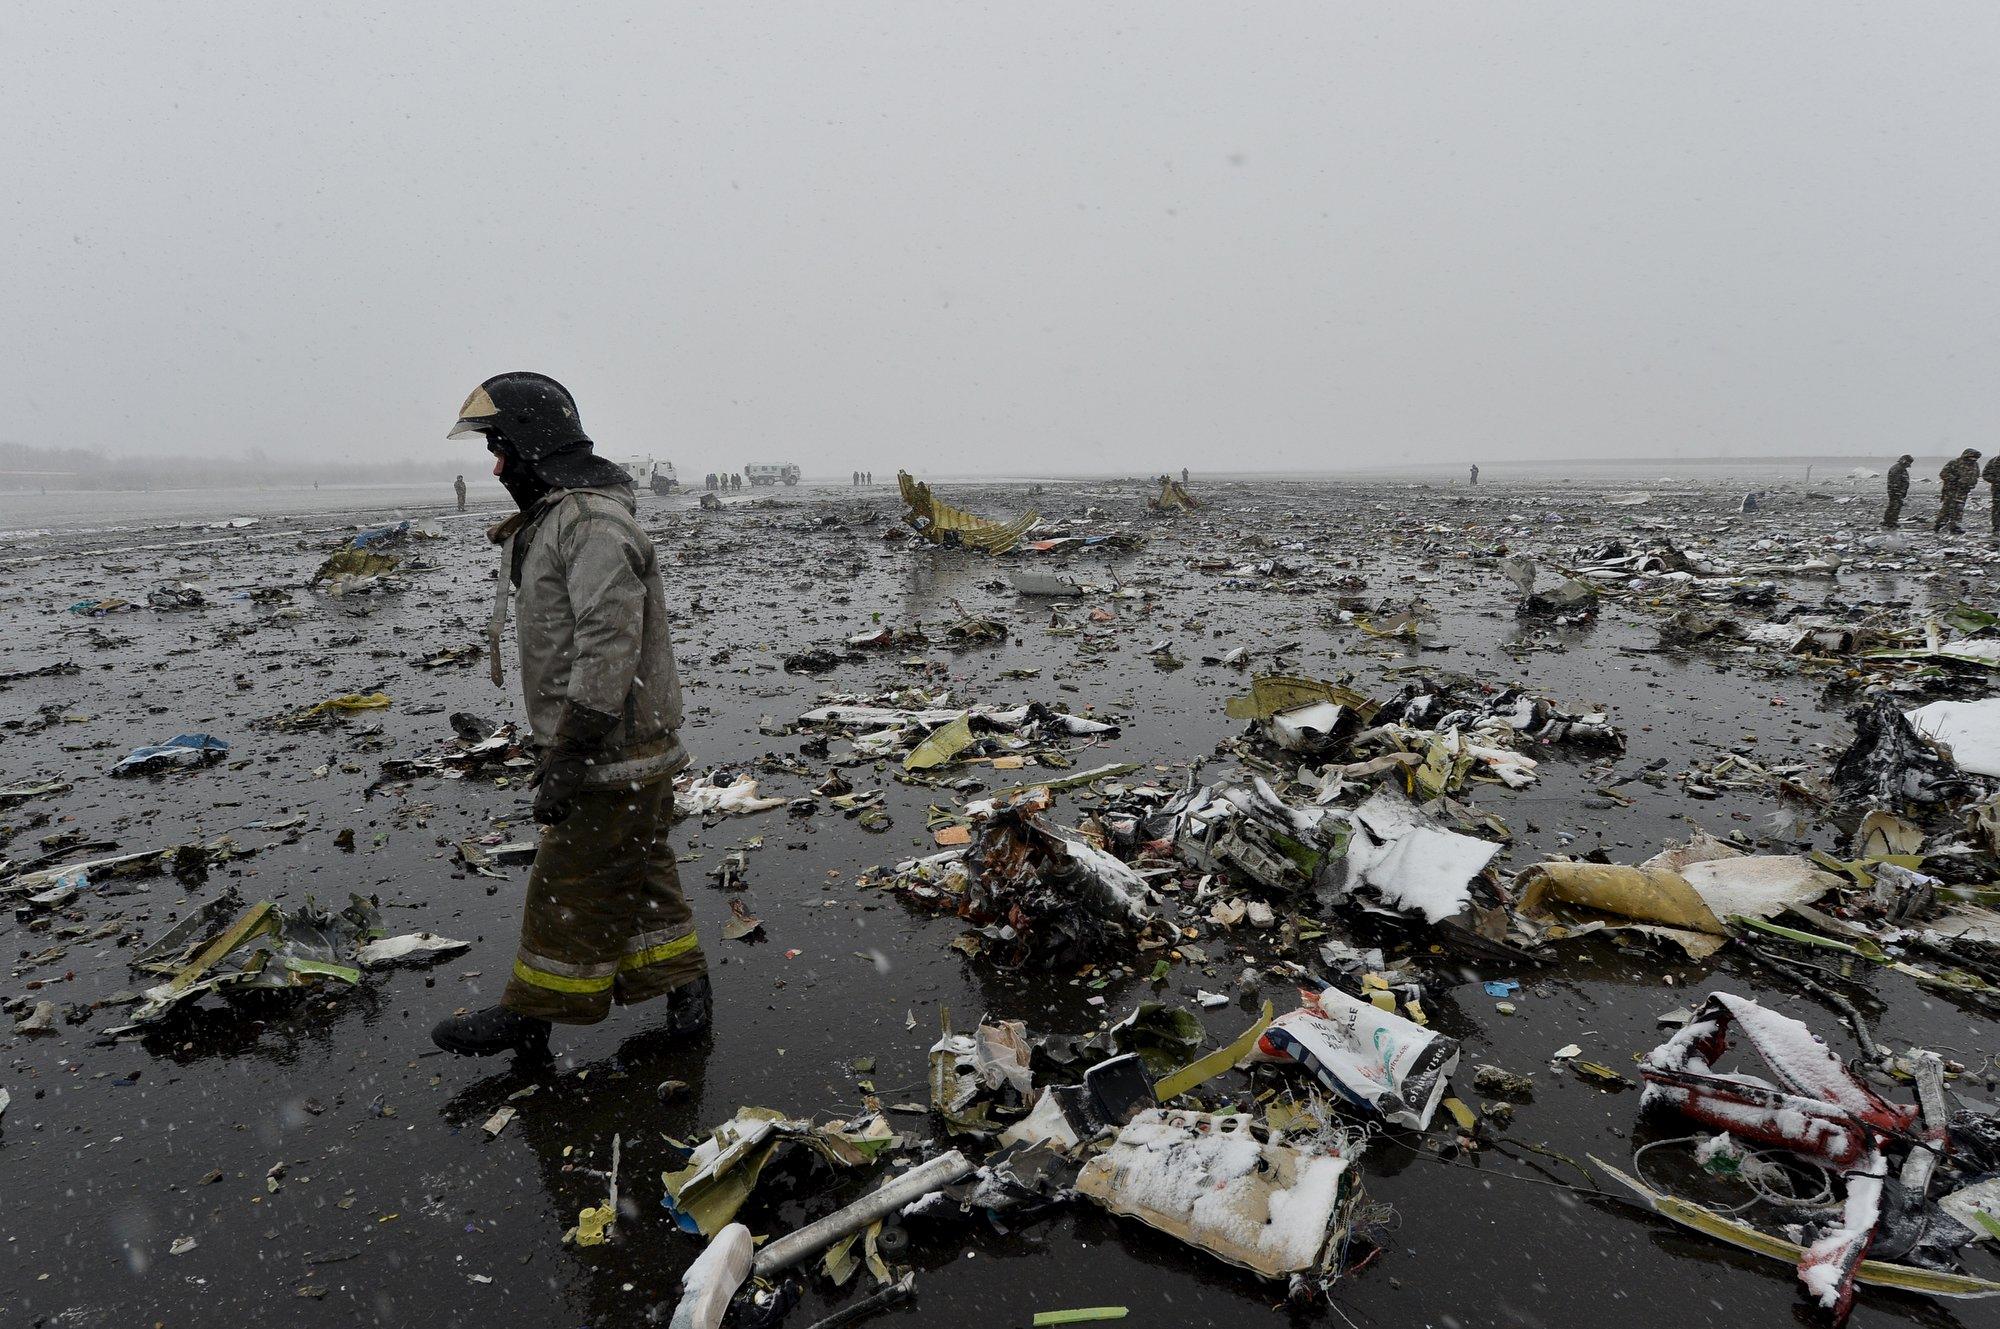 Авиакатастрофа унесла жизни 62 человек Фото: REUTERS